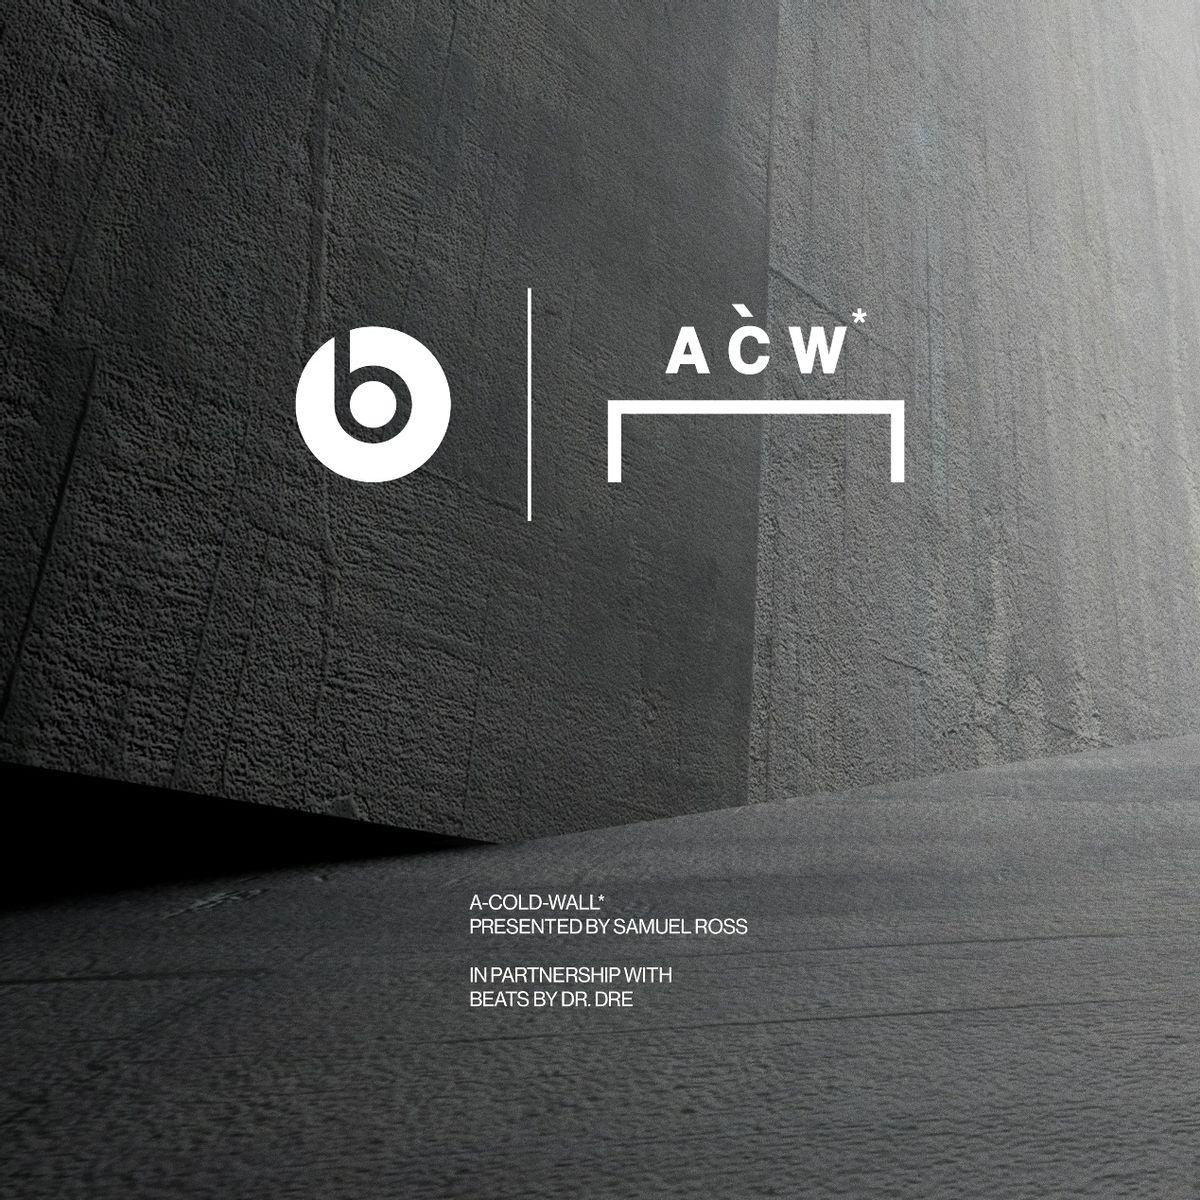 BEATS STUDIO3 WIRELESS新款上线 联名A-COLD-WALL演绎粗犷美学